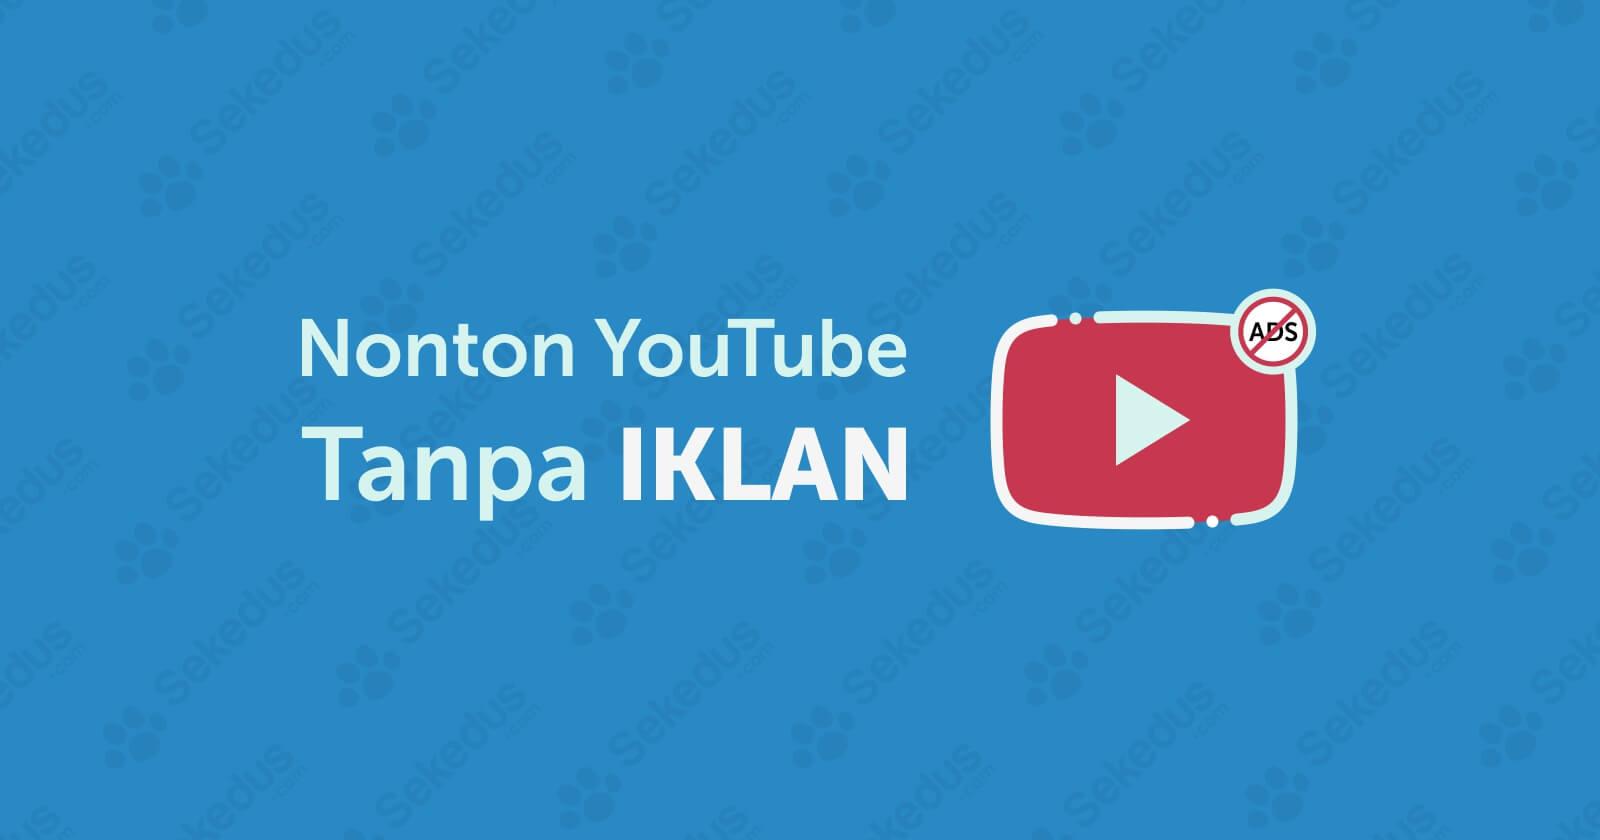 Cara nonton youtube tanpa iklan